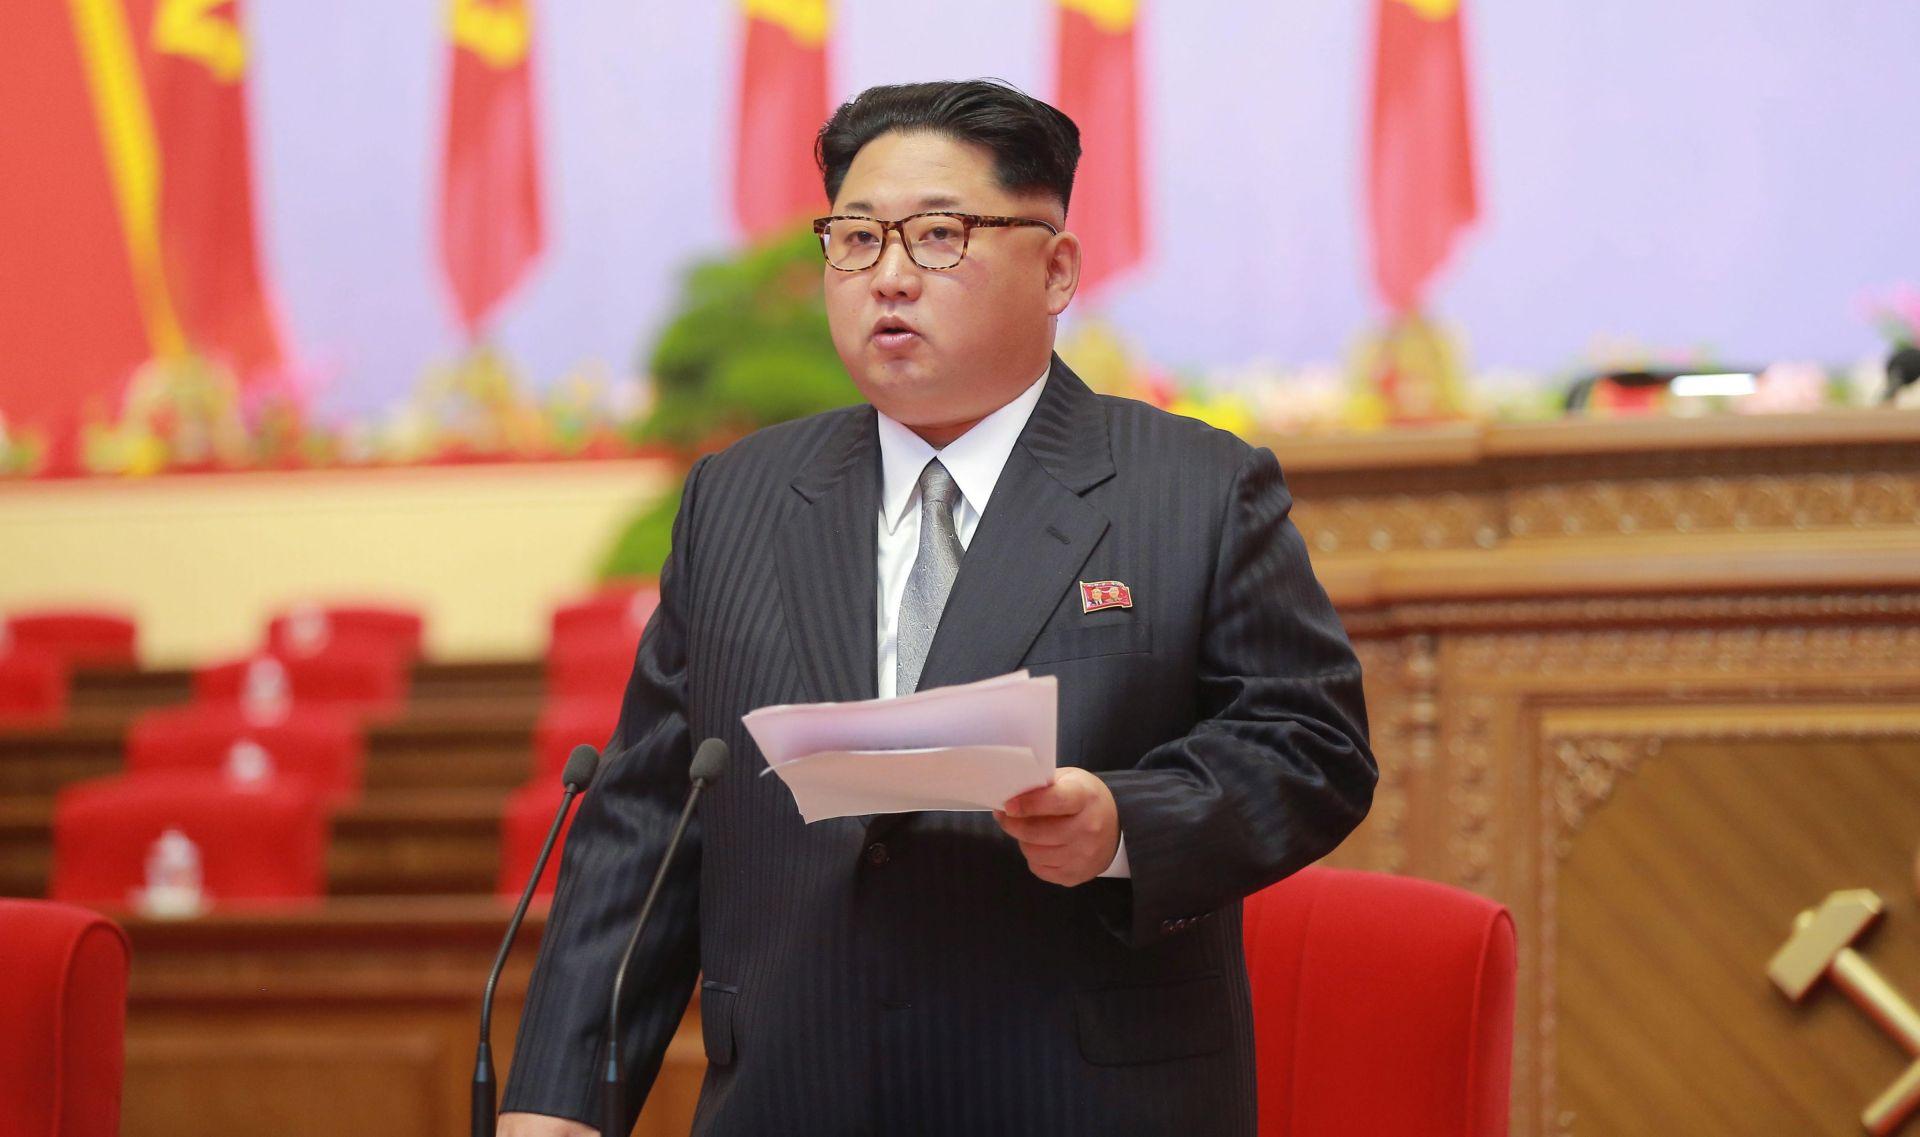 UOČI KONGRESA: Sjeverna Koreja uhitila i protjerala BBC-jeva novinara